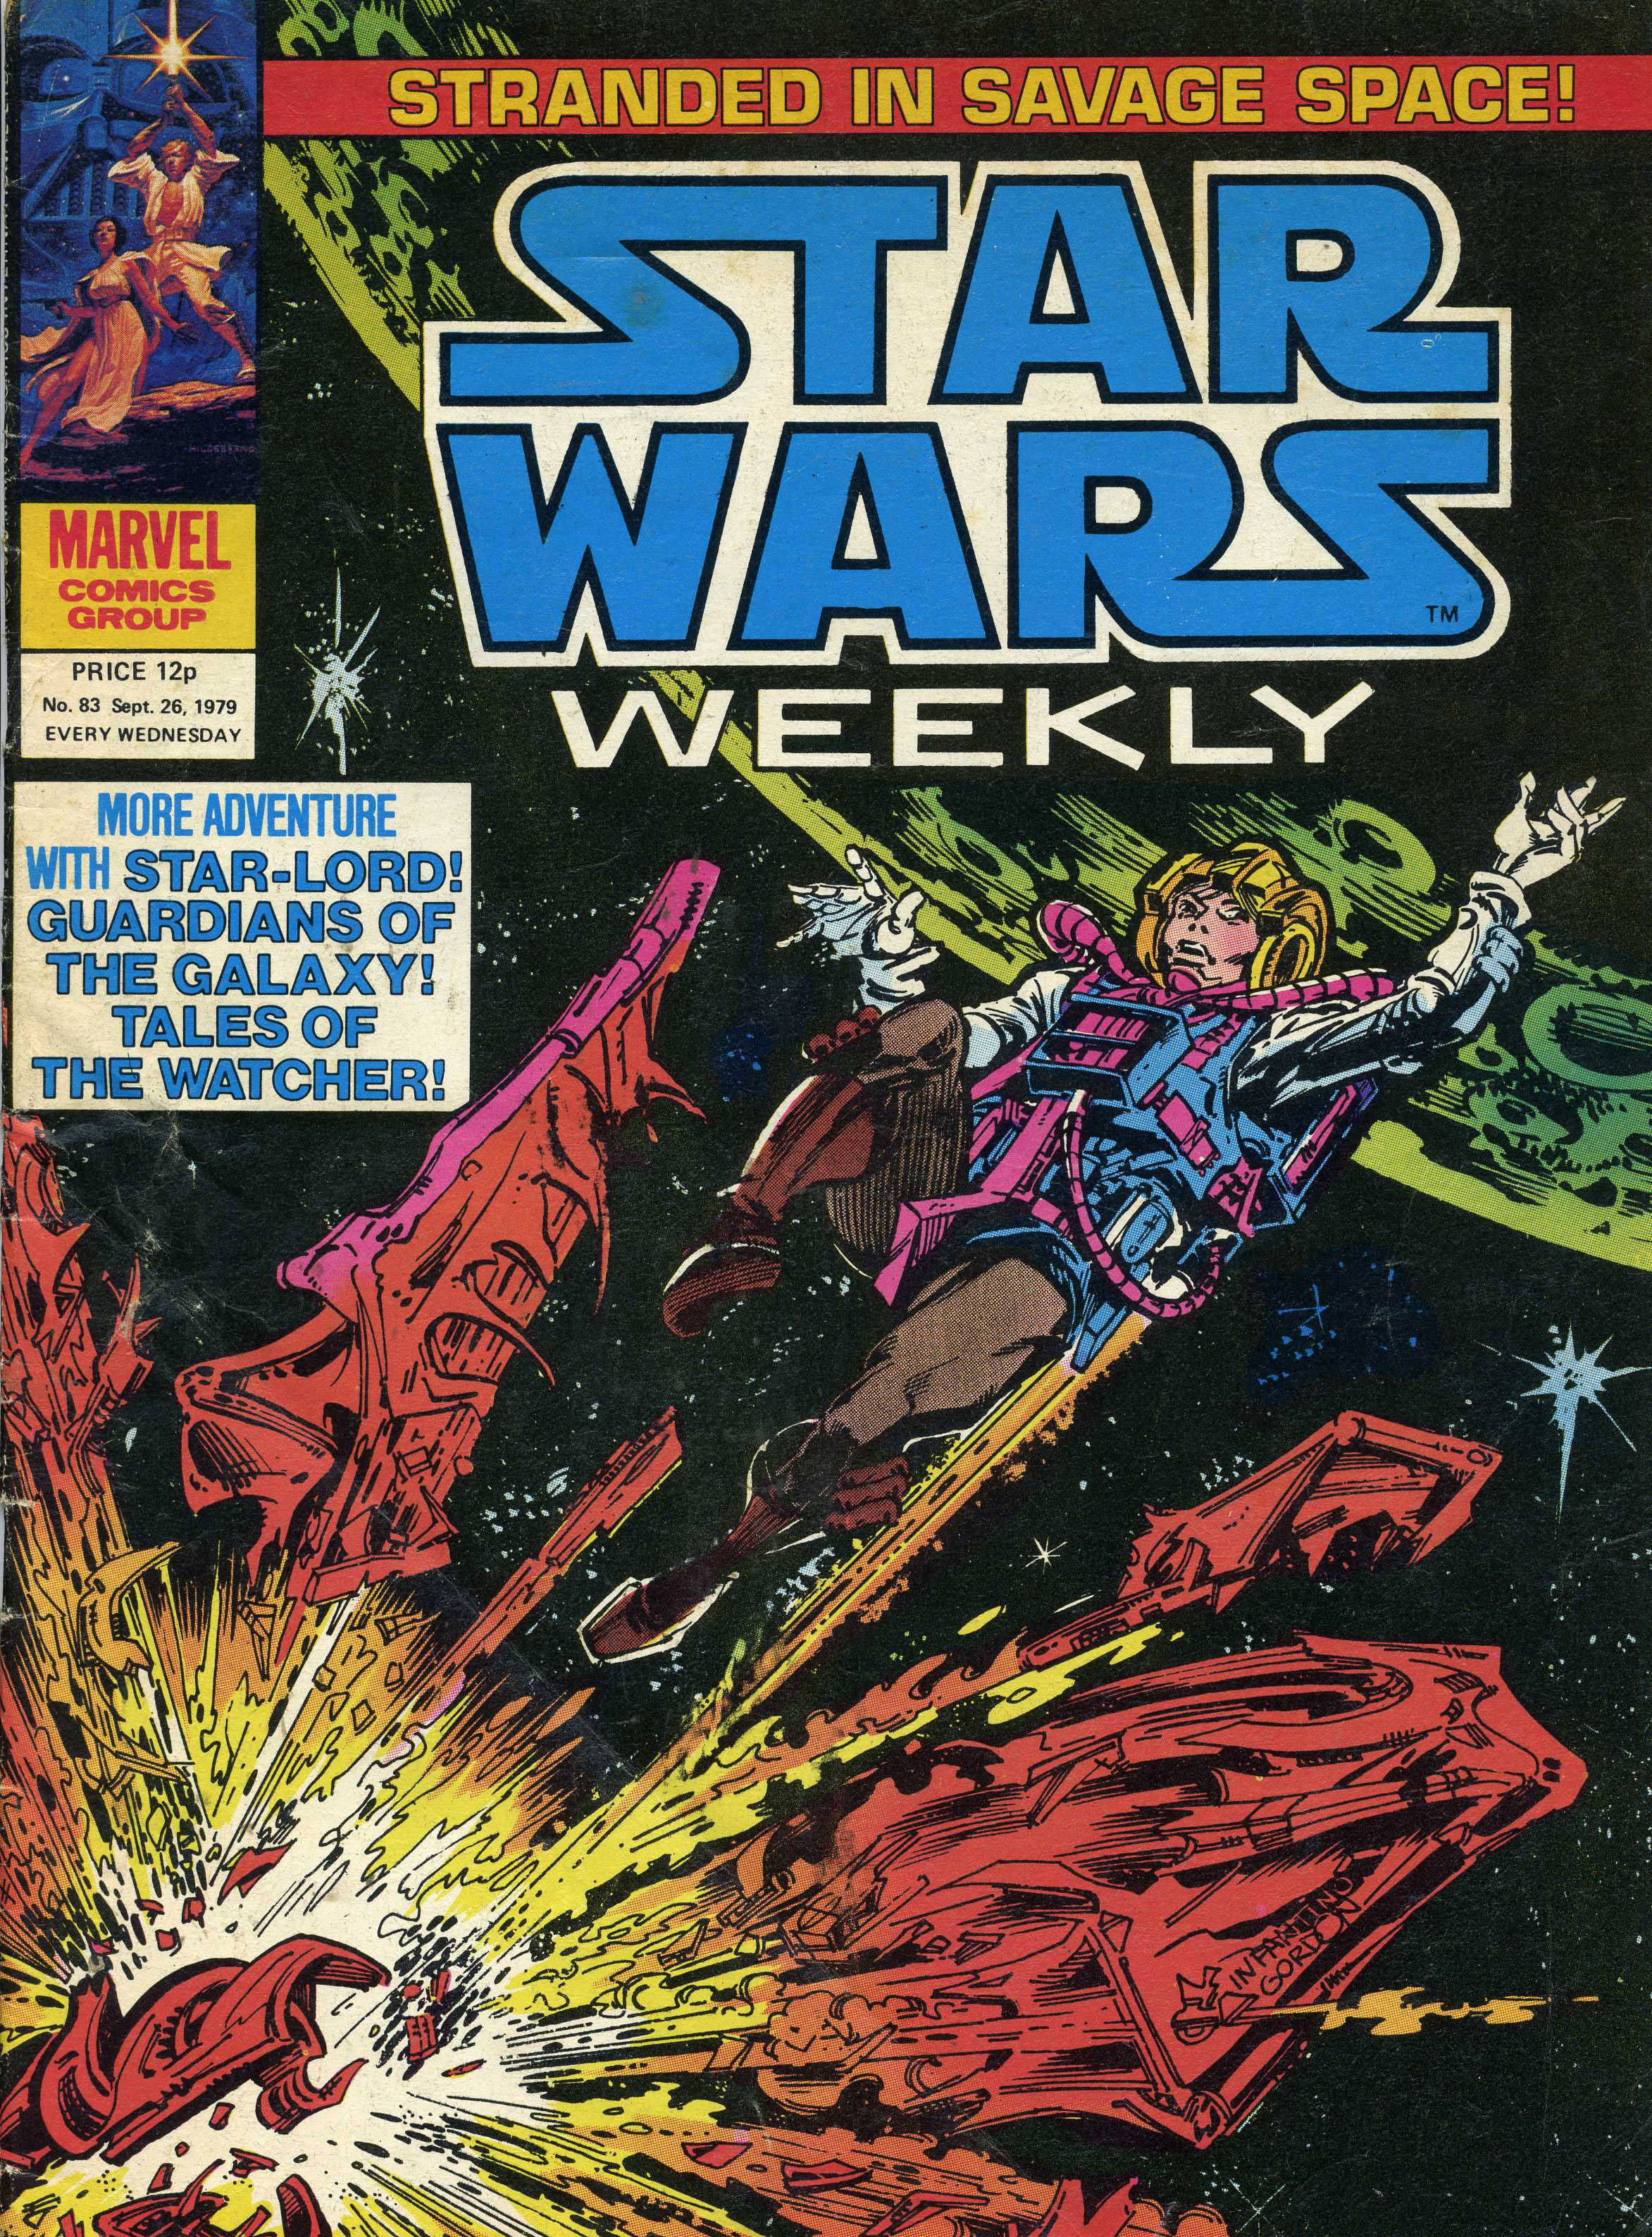 Star Wars Weekly 83